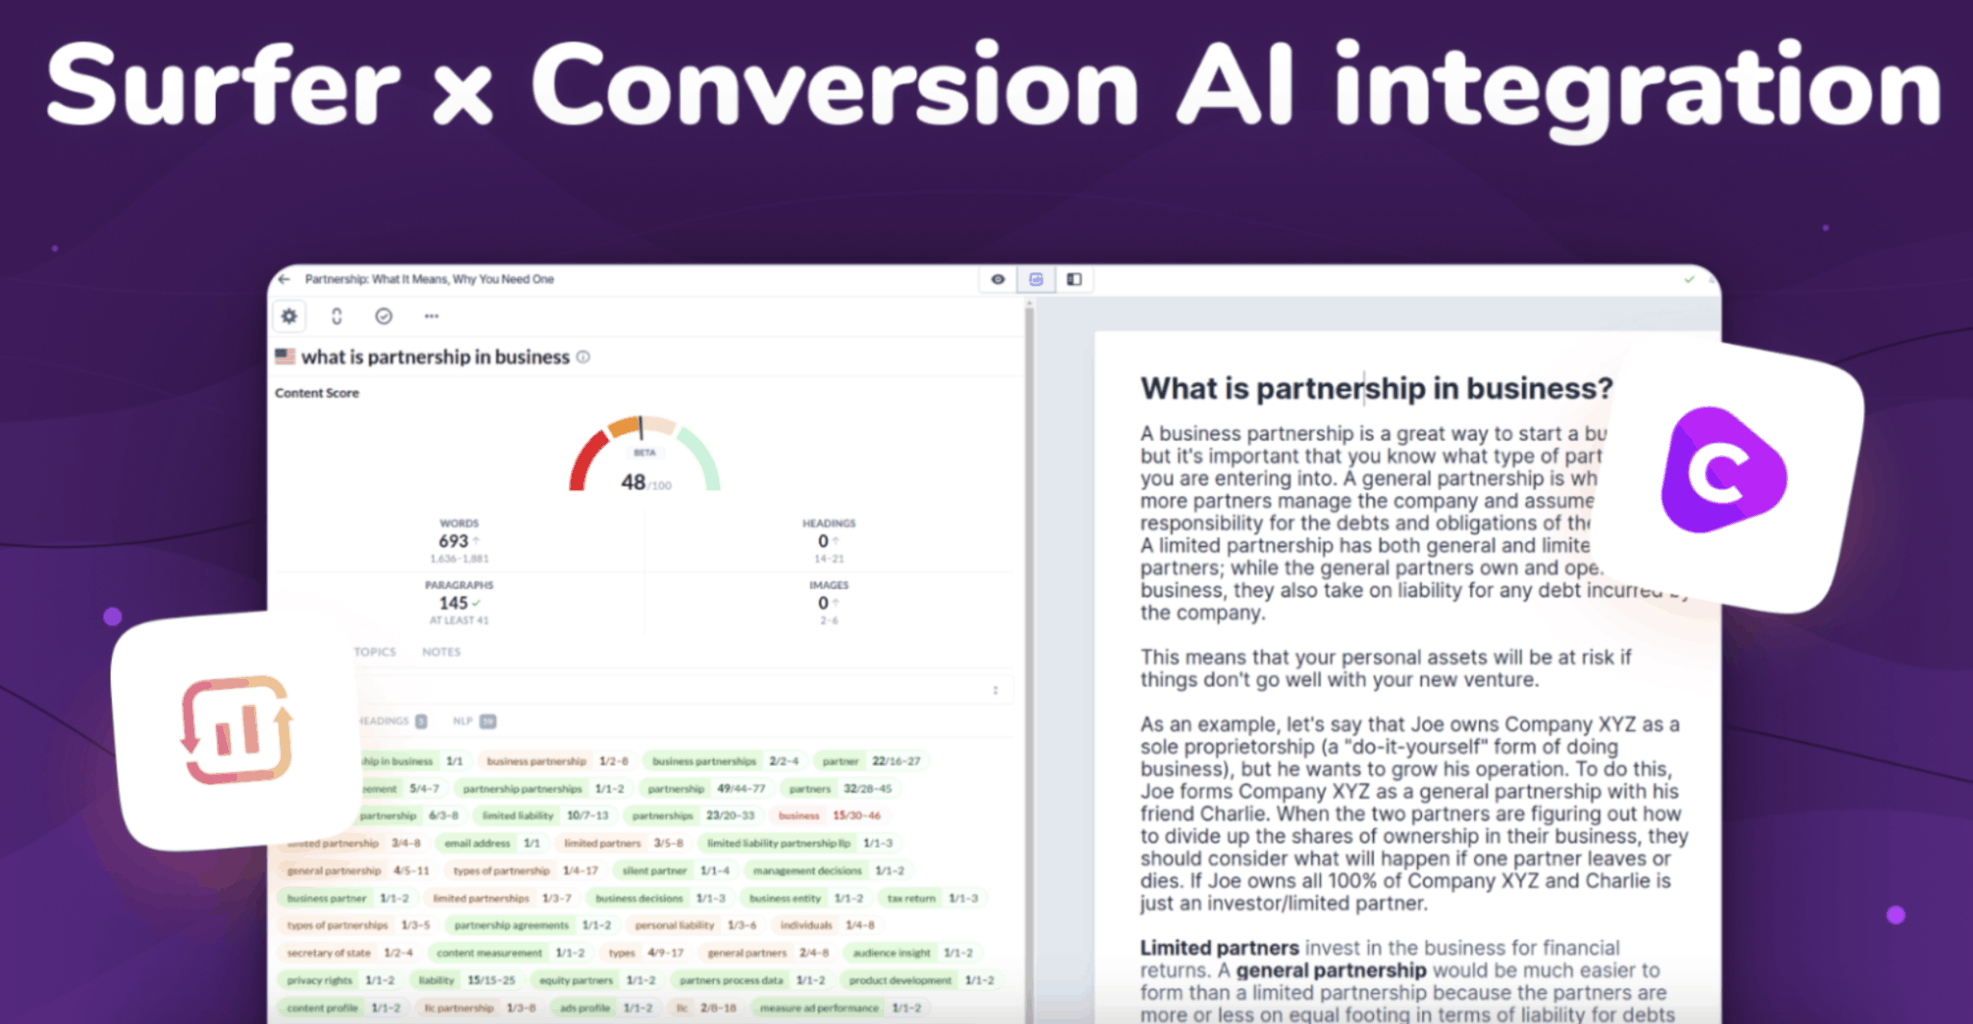 Surfer and Conversion.AI integration